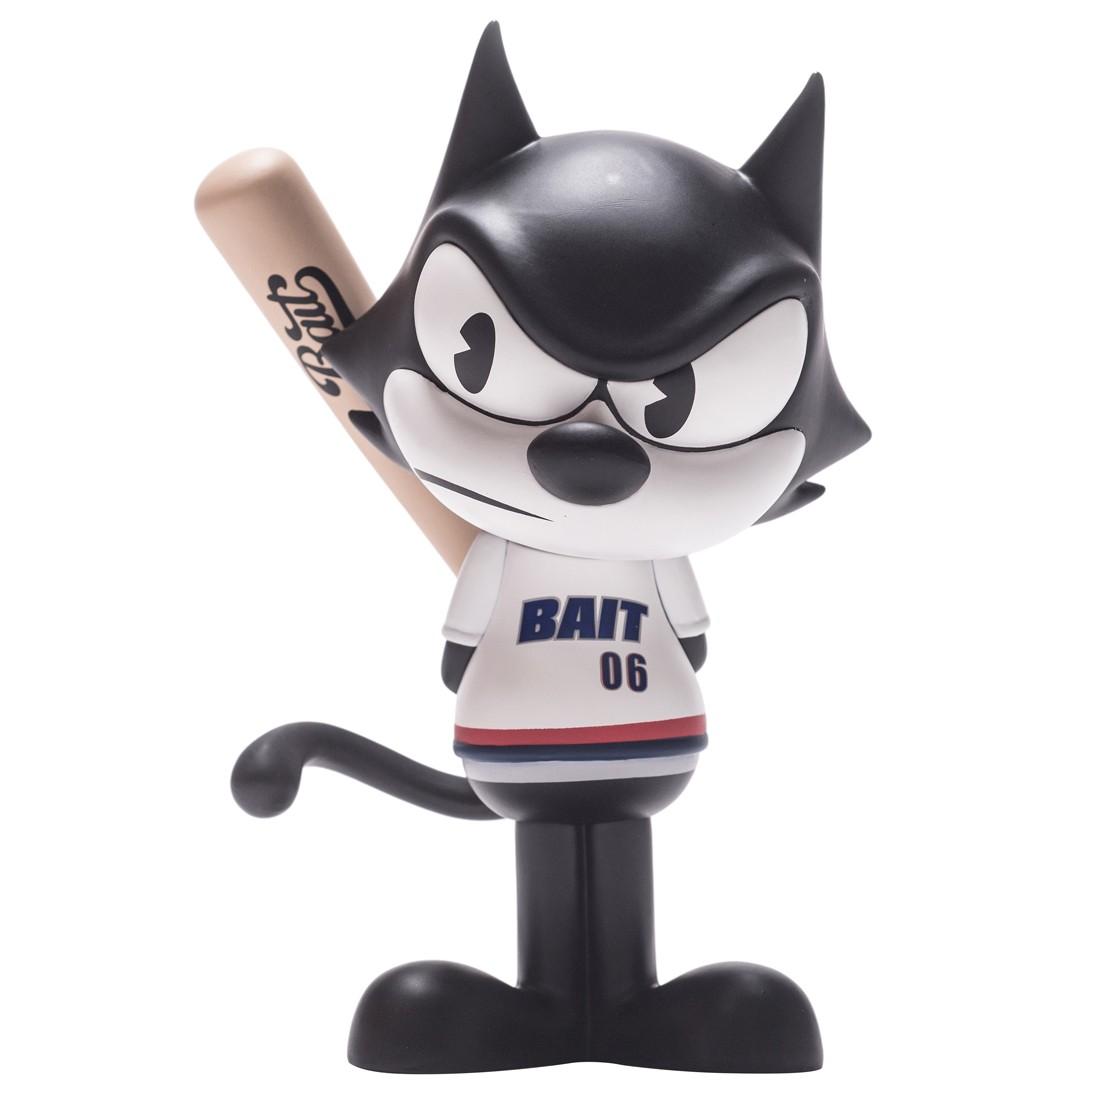 BAIT x Dreamworks x SWITCH Collectibles Felix the Cat Slugger 6 Inch Figure - Portland Exclusive (black / white)